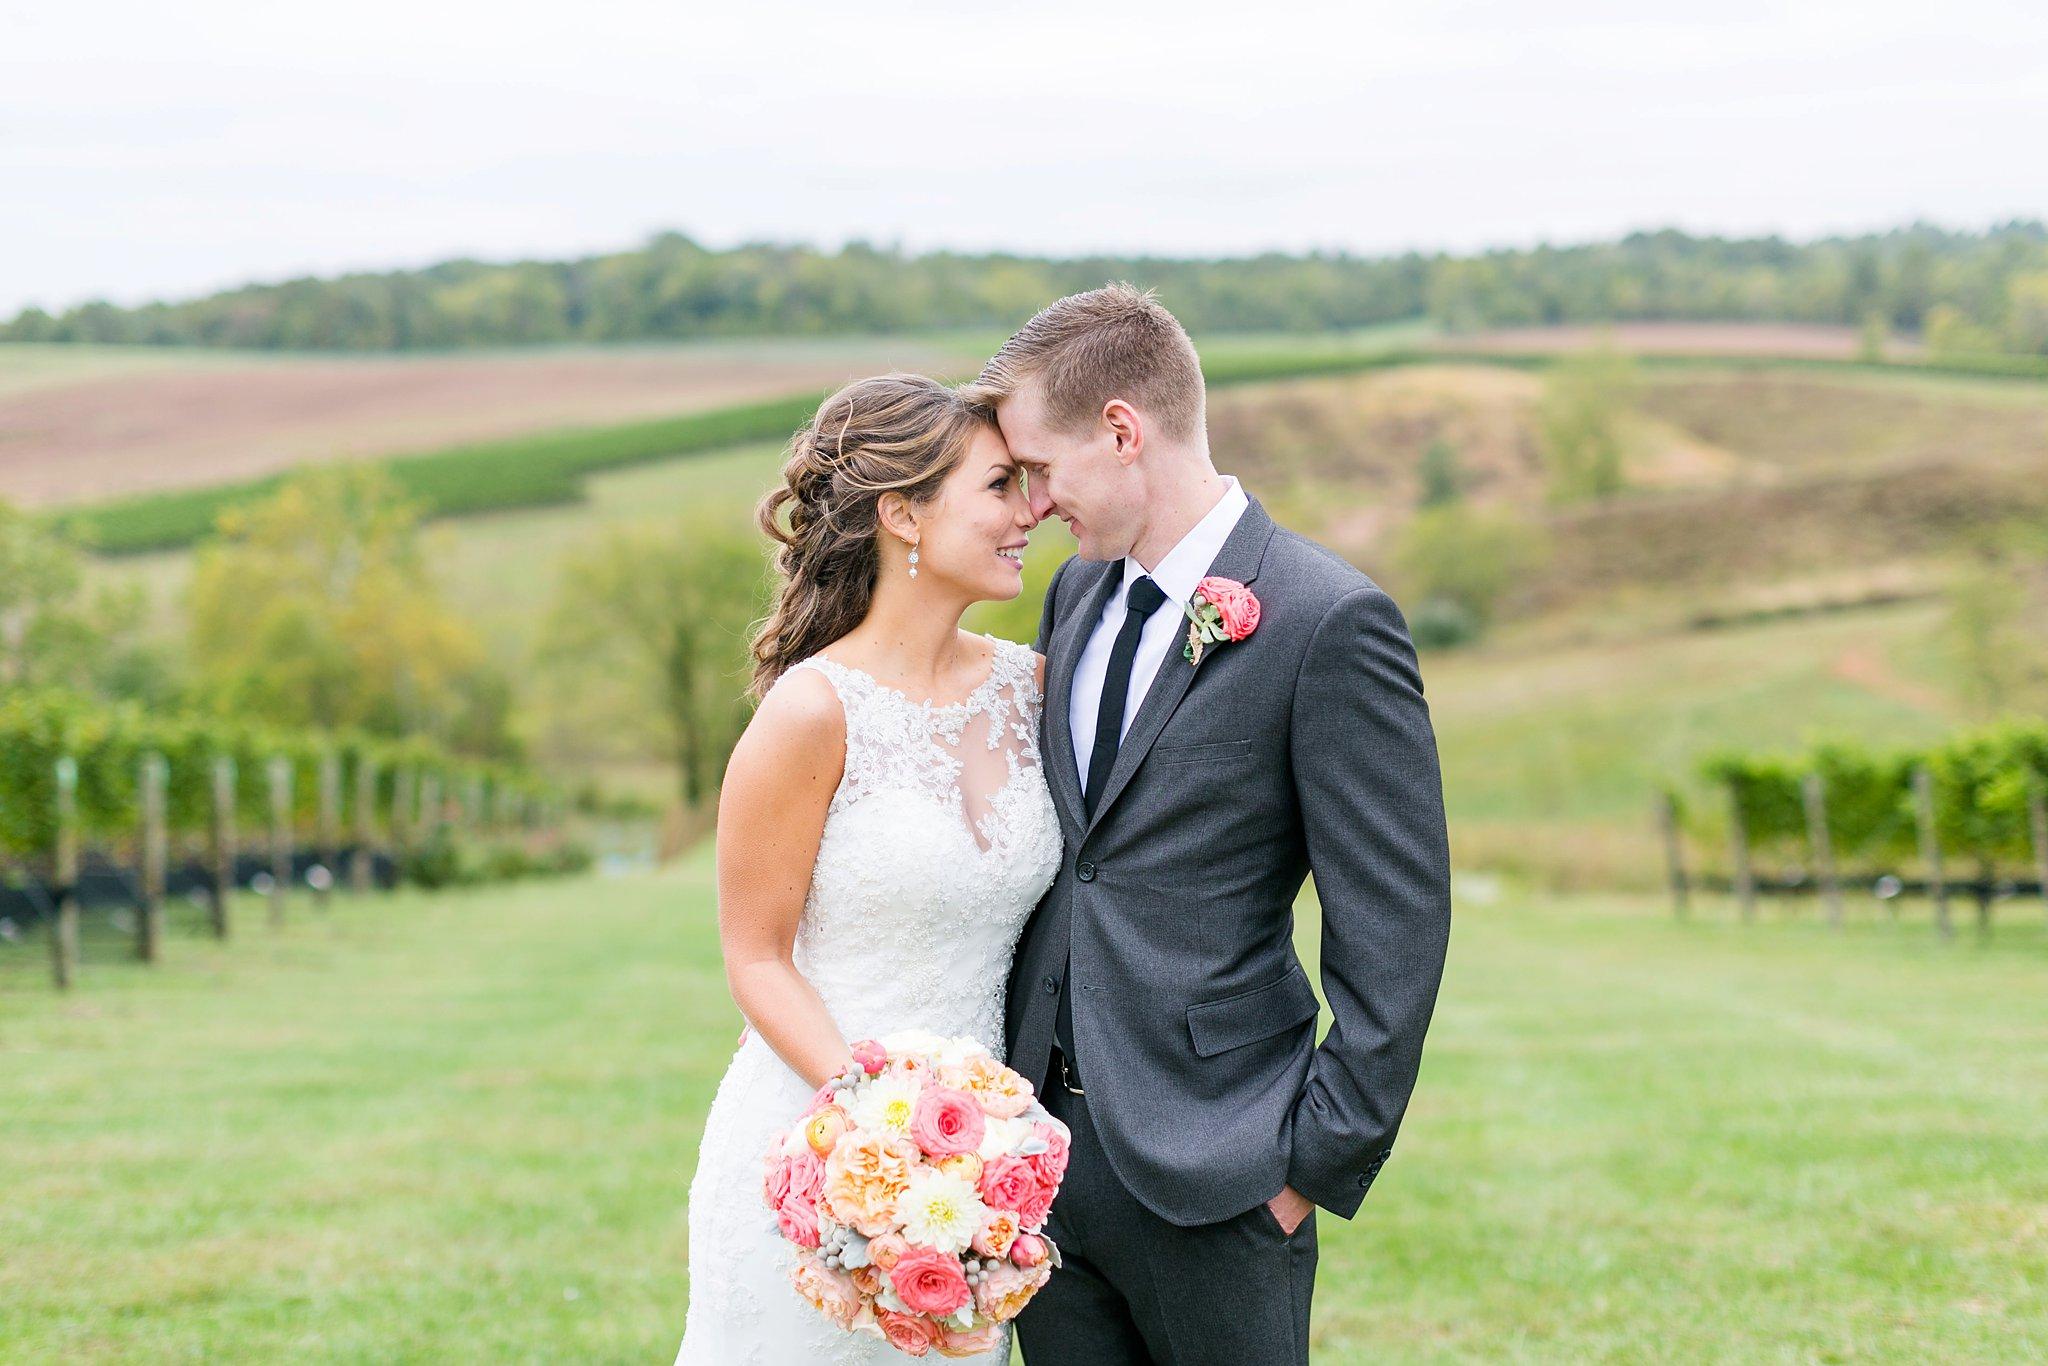 Stone Tower Winery Wedding Photos Virginia Wedding Photographer Megan Kelsey Photography Sam & Angela-227.jpg